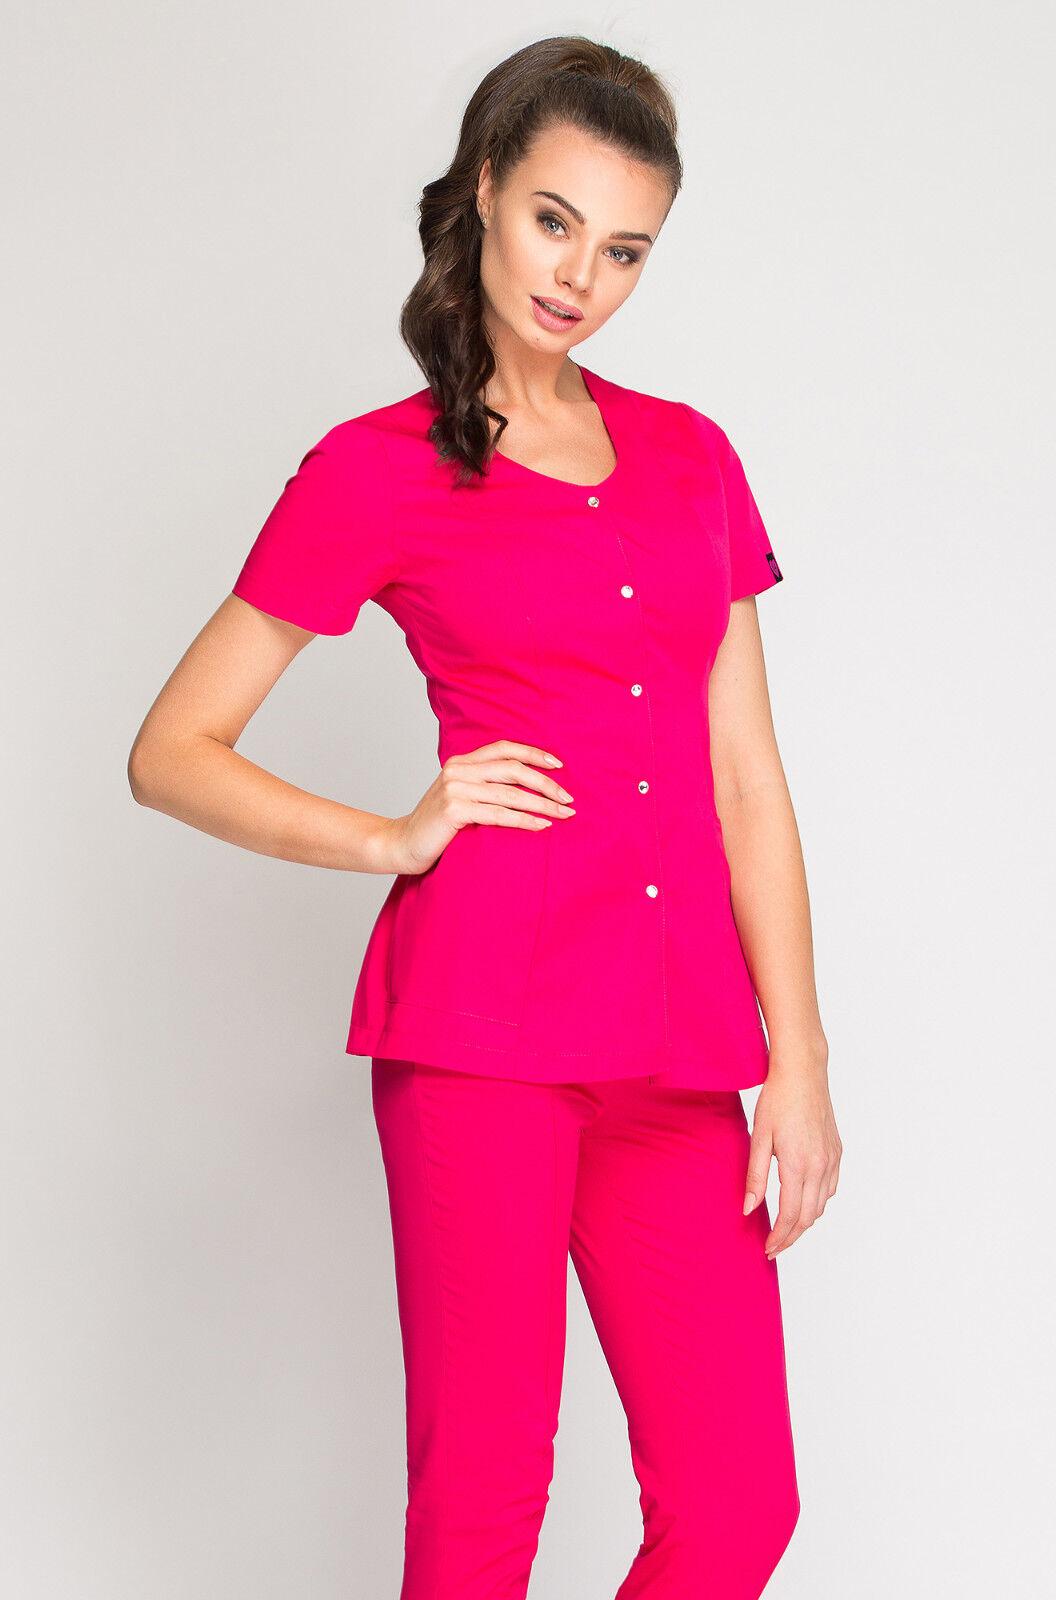 Damenkasack Damen Tunika Kasack Pflege SPA Schürze Medizin Berufskleidung Kasak